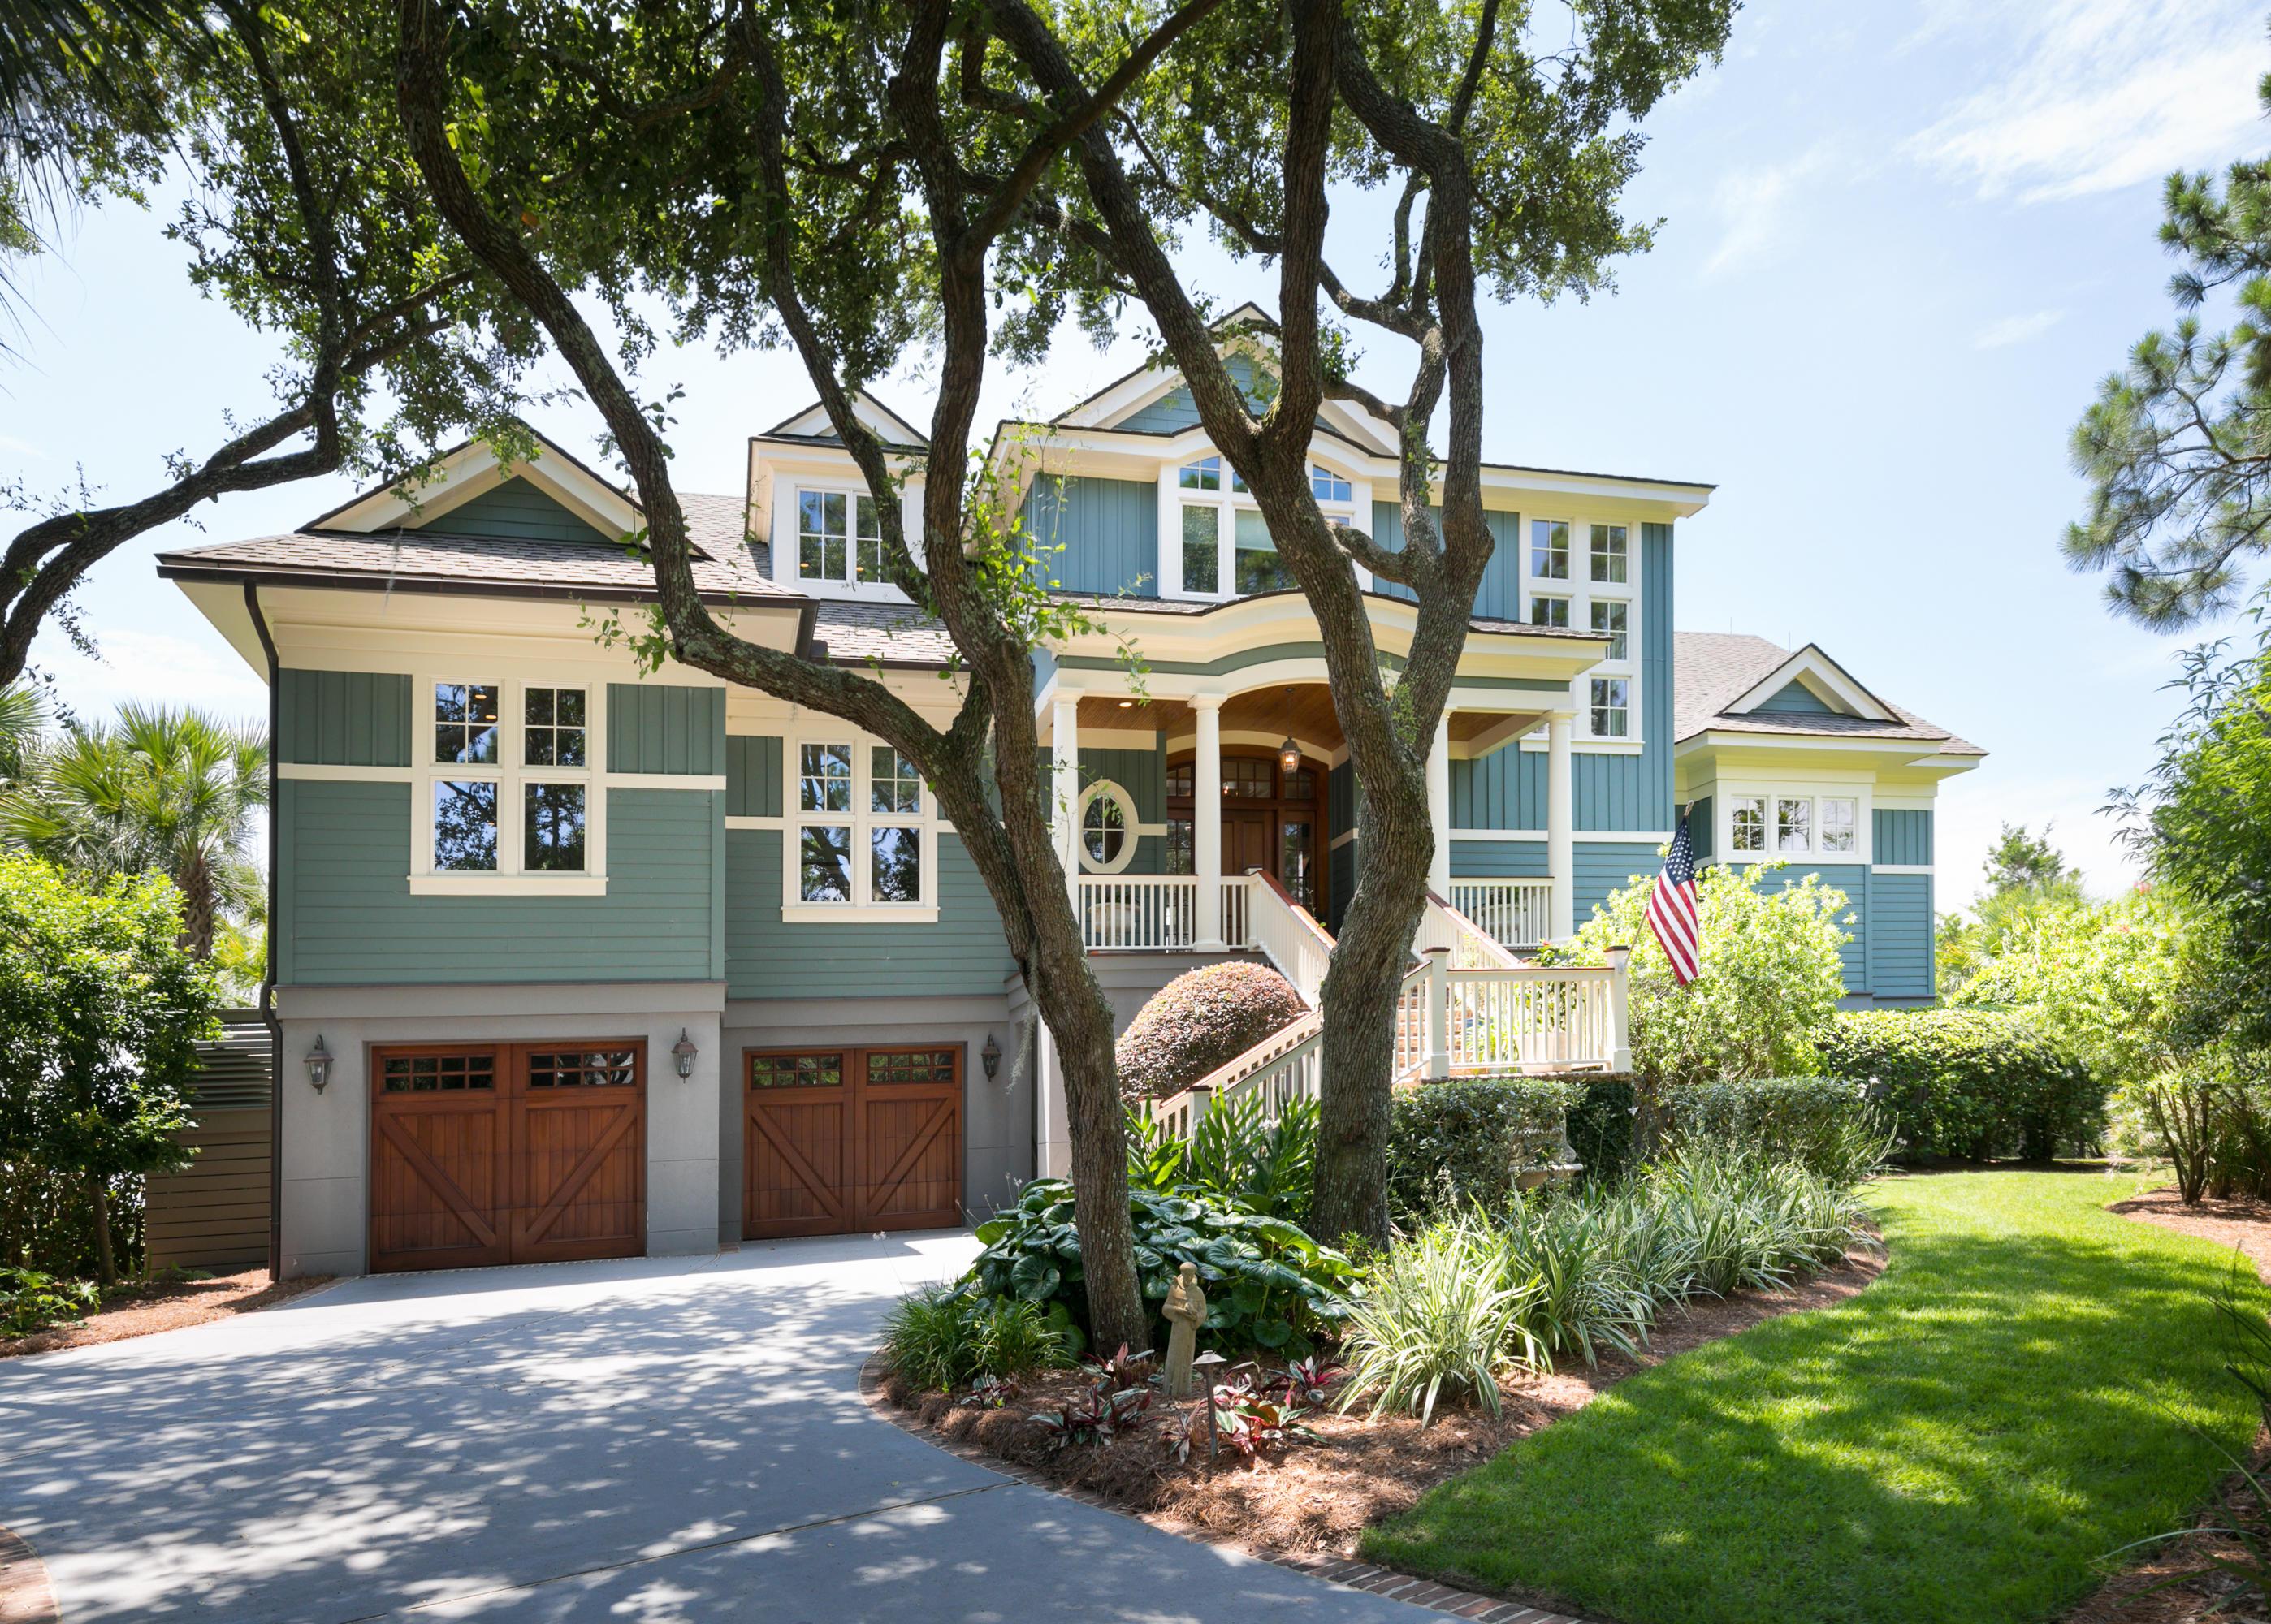 Seabrook Island Homes For Sale - 3033 Marshgate, Johns Island, SC - 14